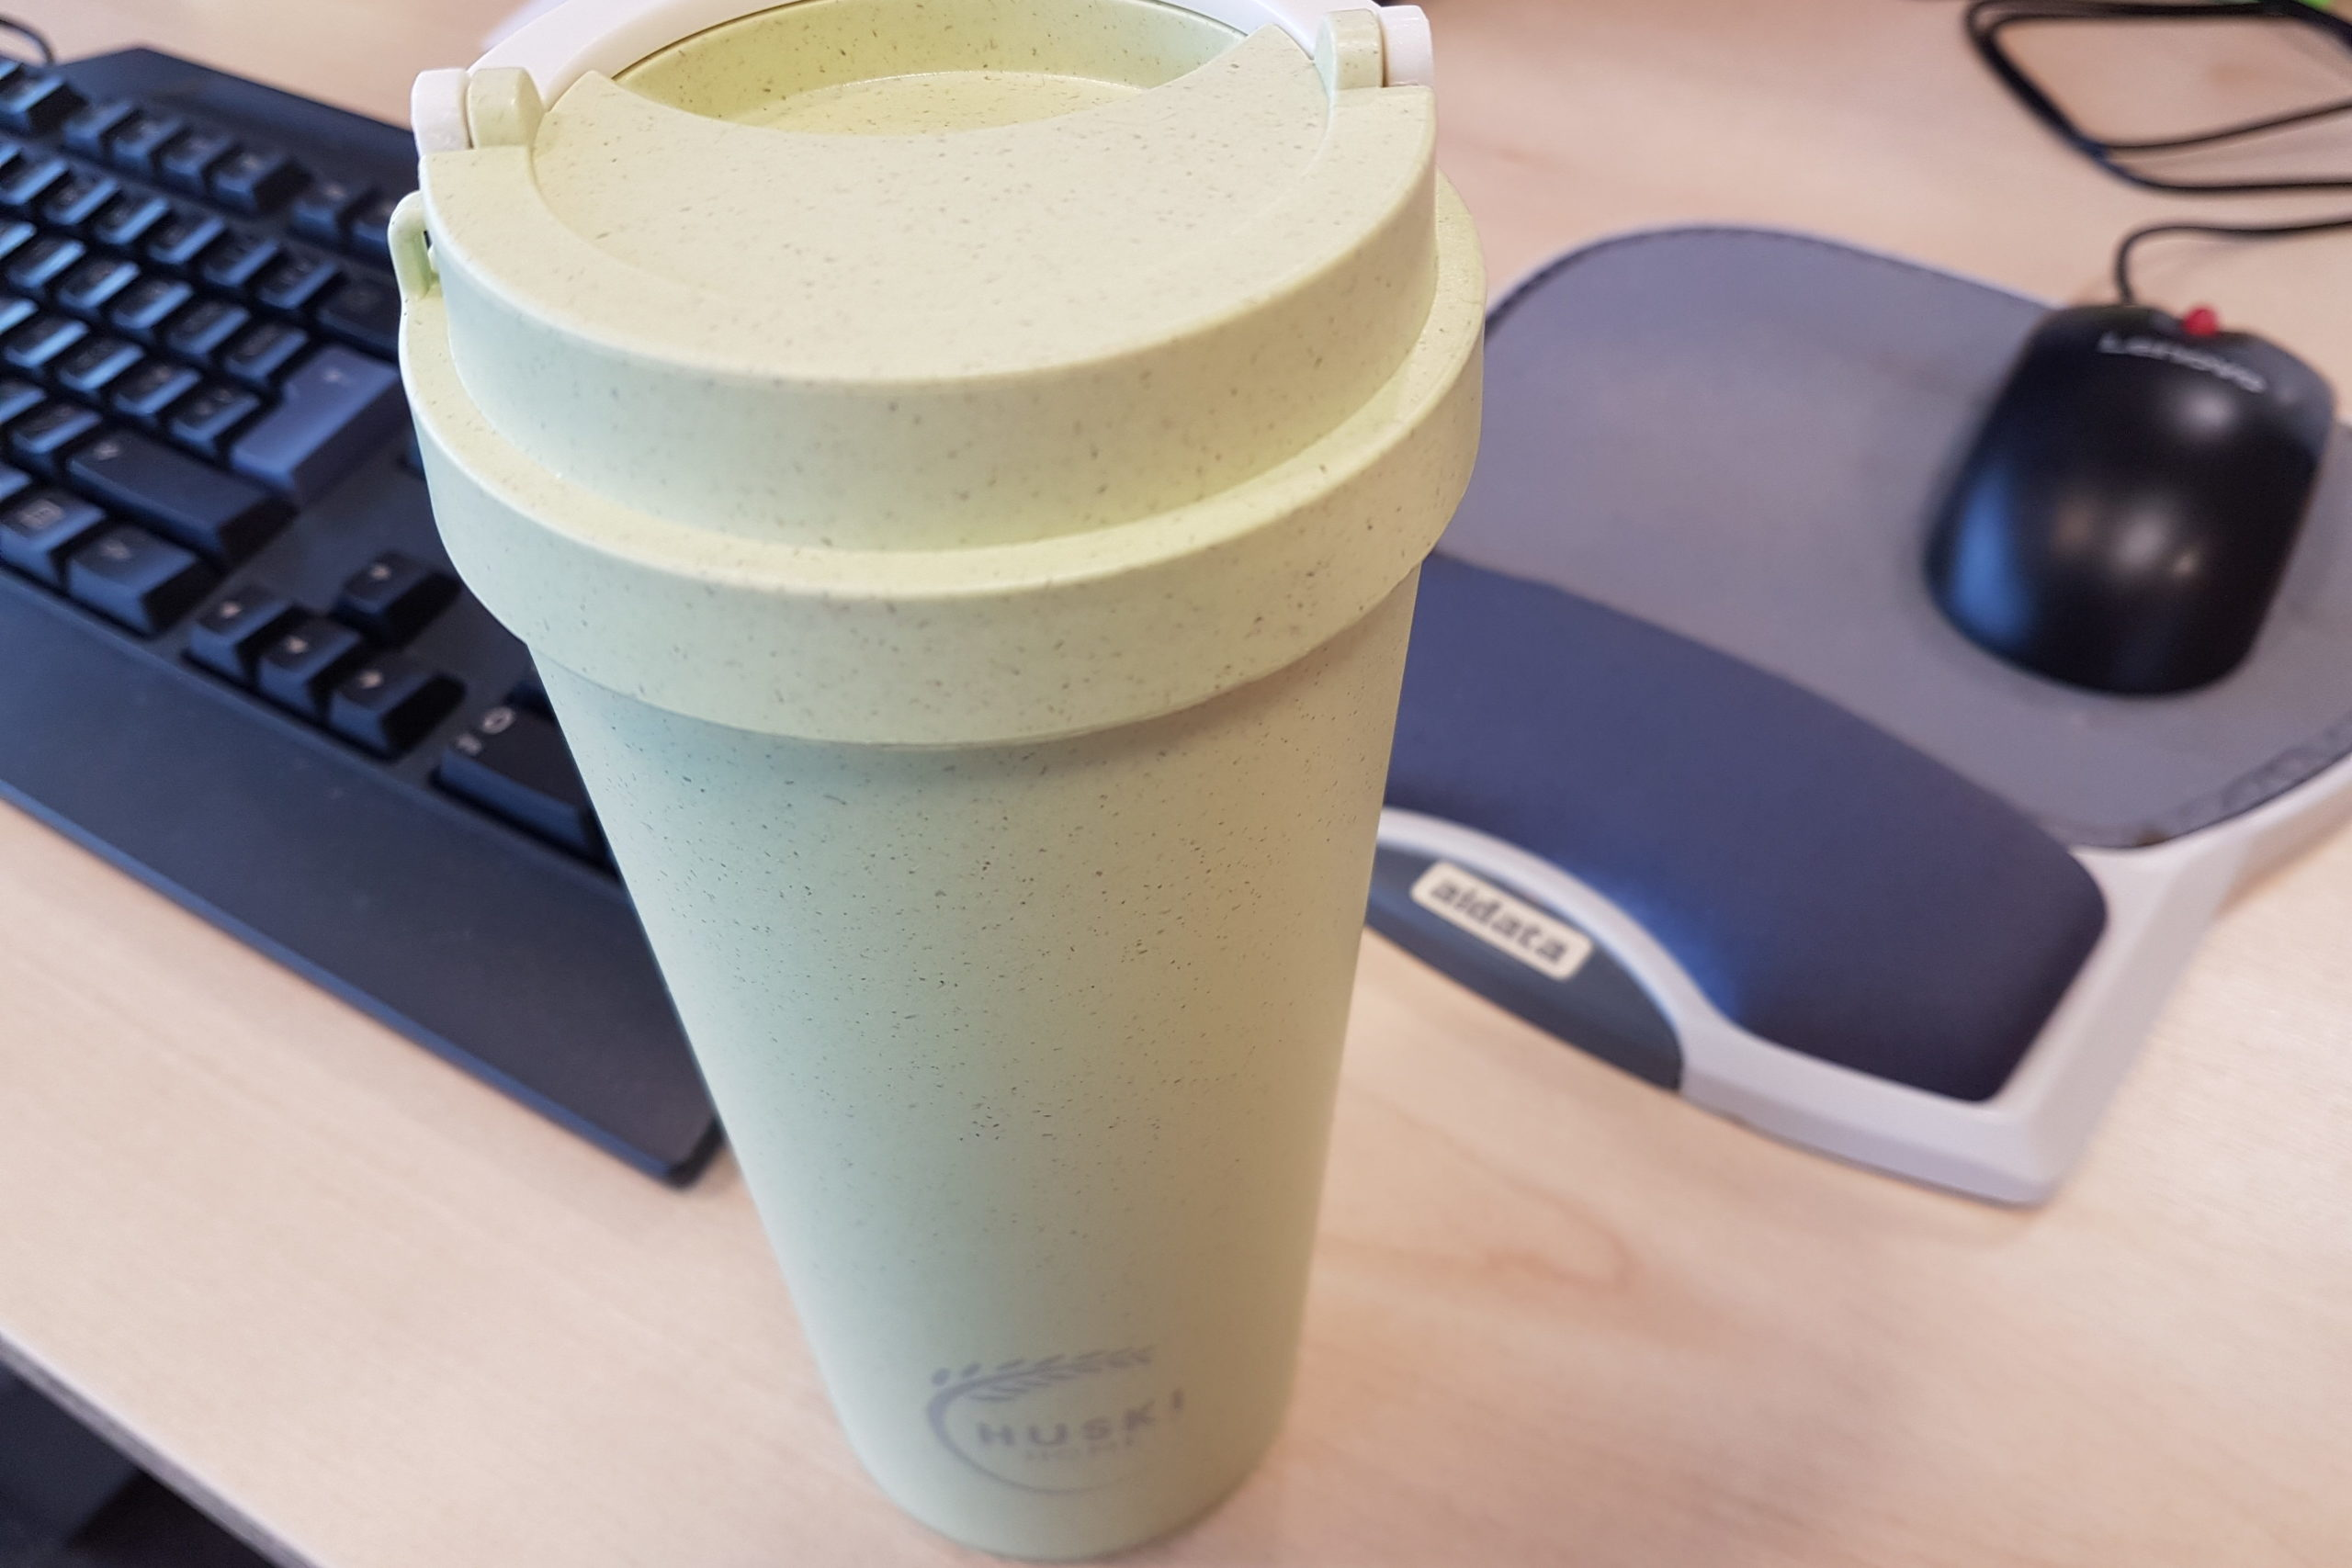 Huski Home sustainable rice husk travel cup in pistachio